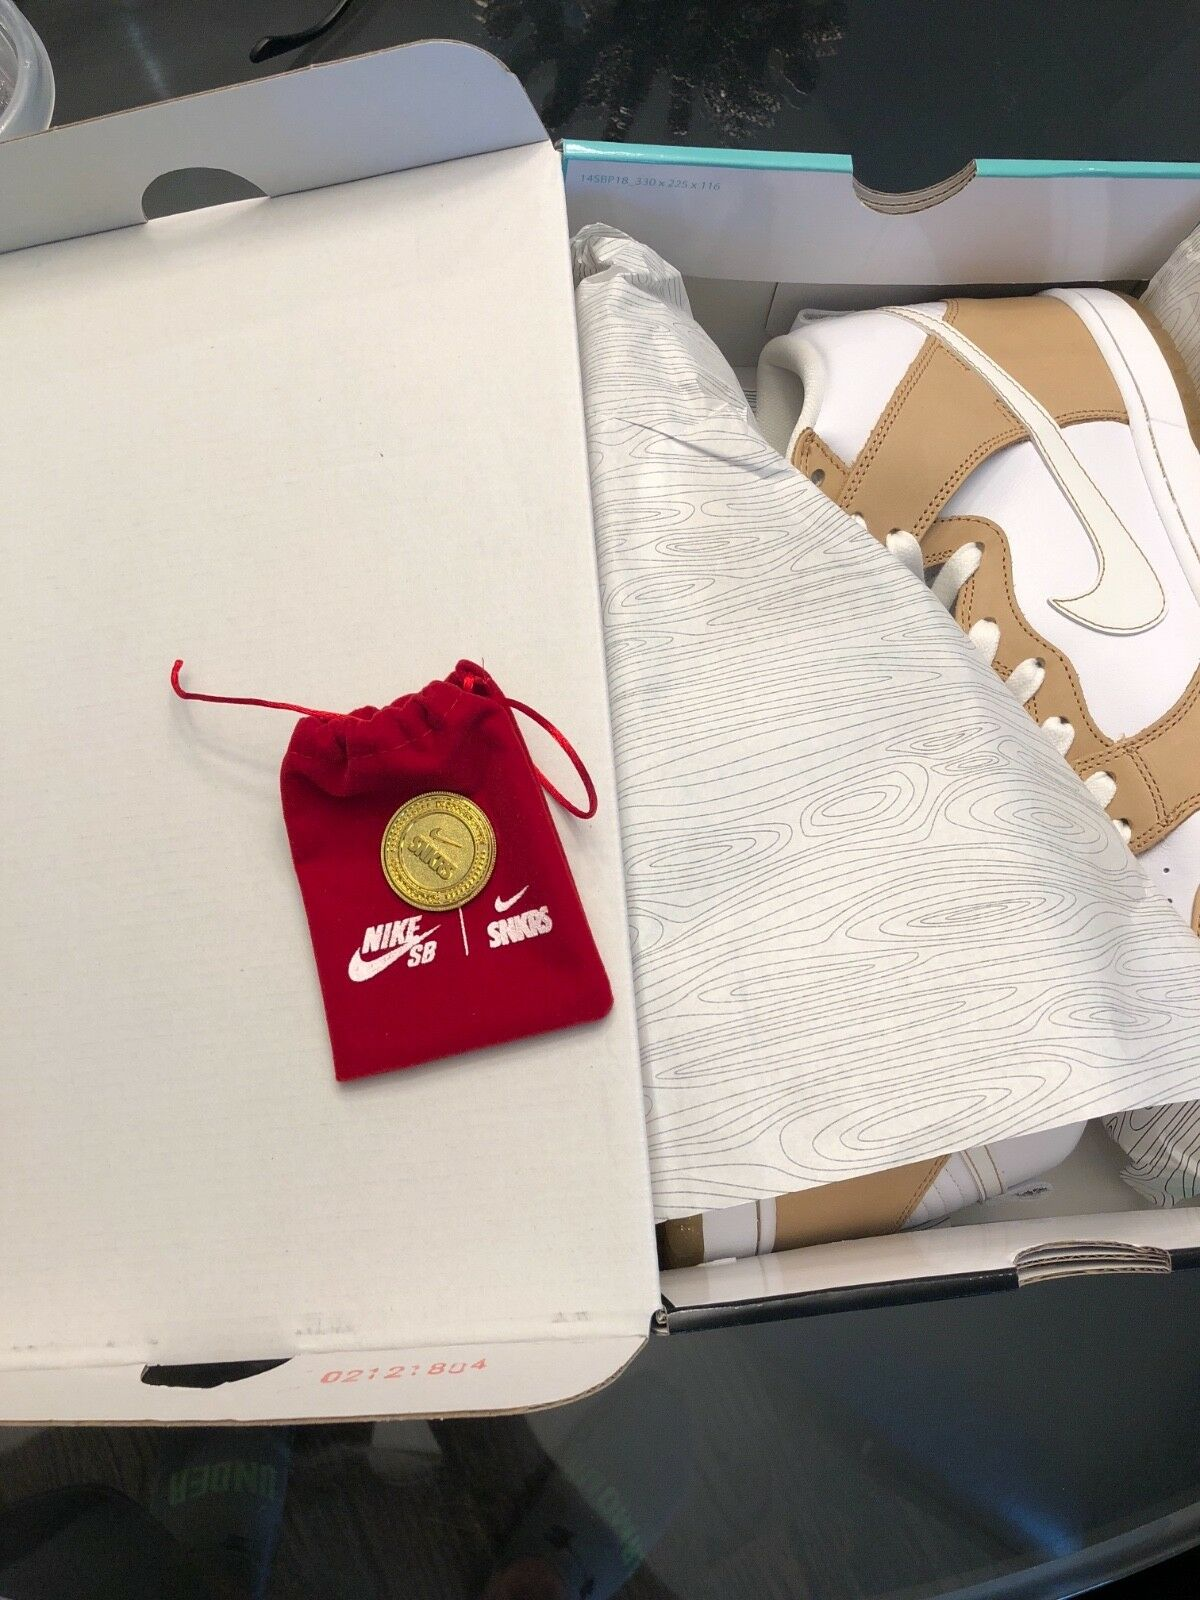 Nike SB x Premier Dunk High TRD QS QS QS  Win Some,Lose Some  - Vachetta Tan - 9.5 727411